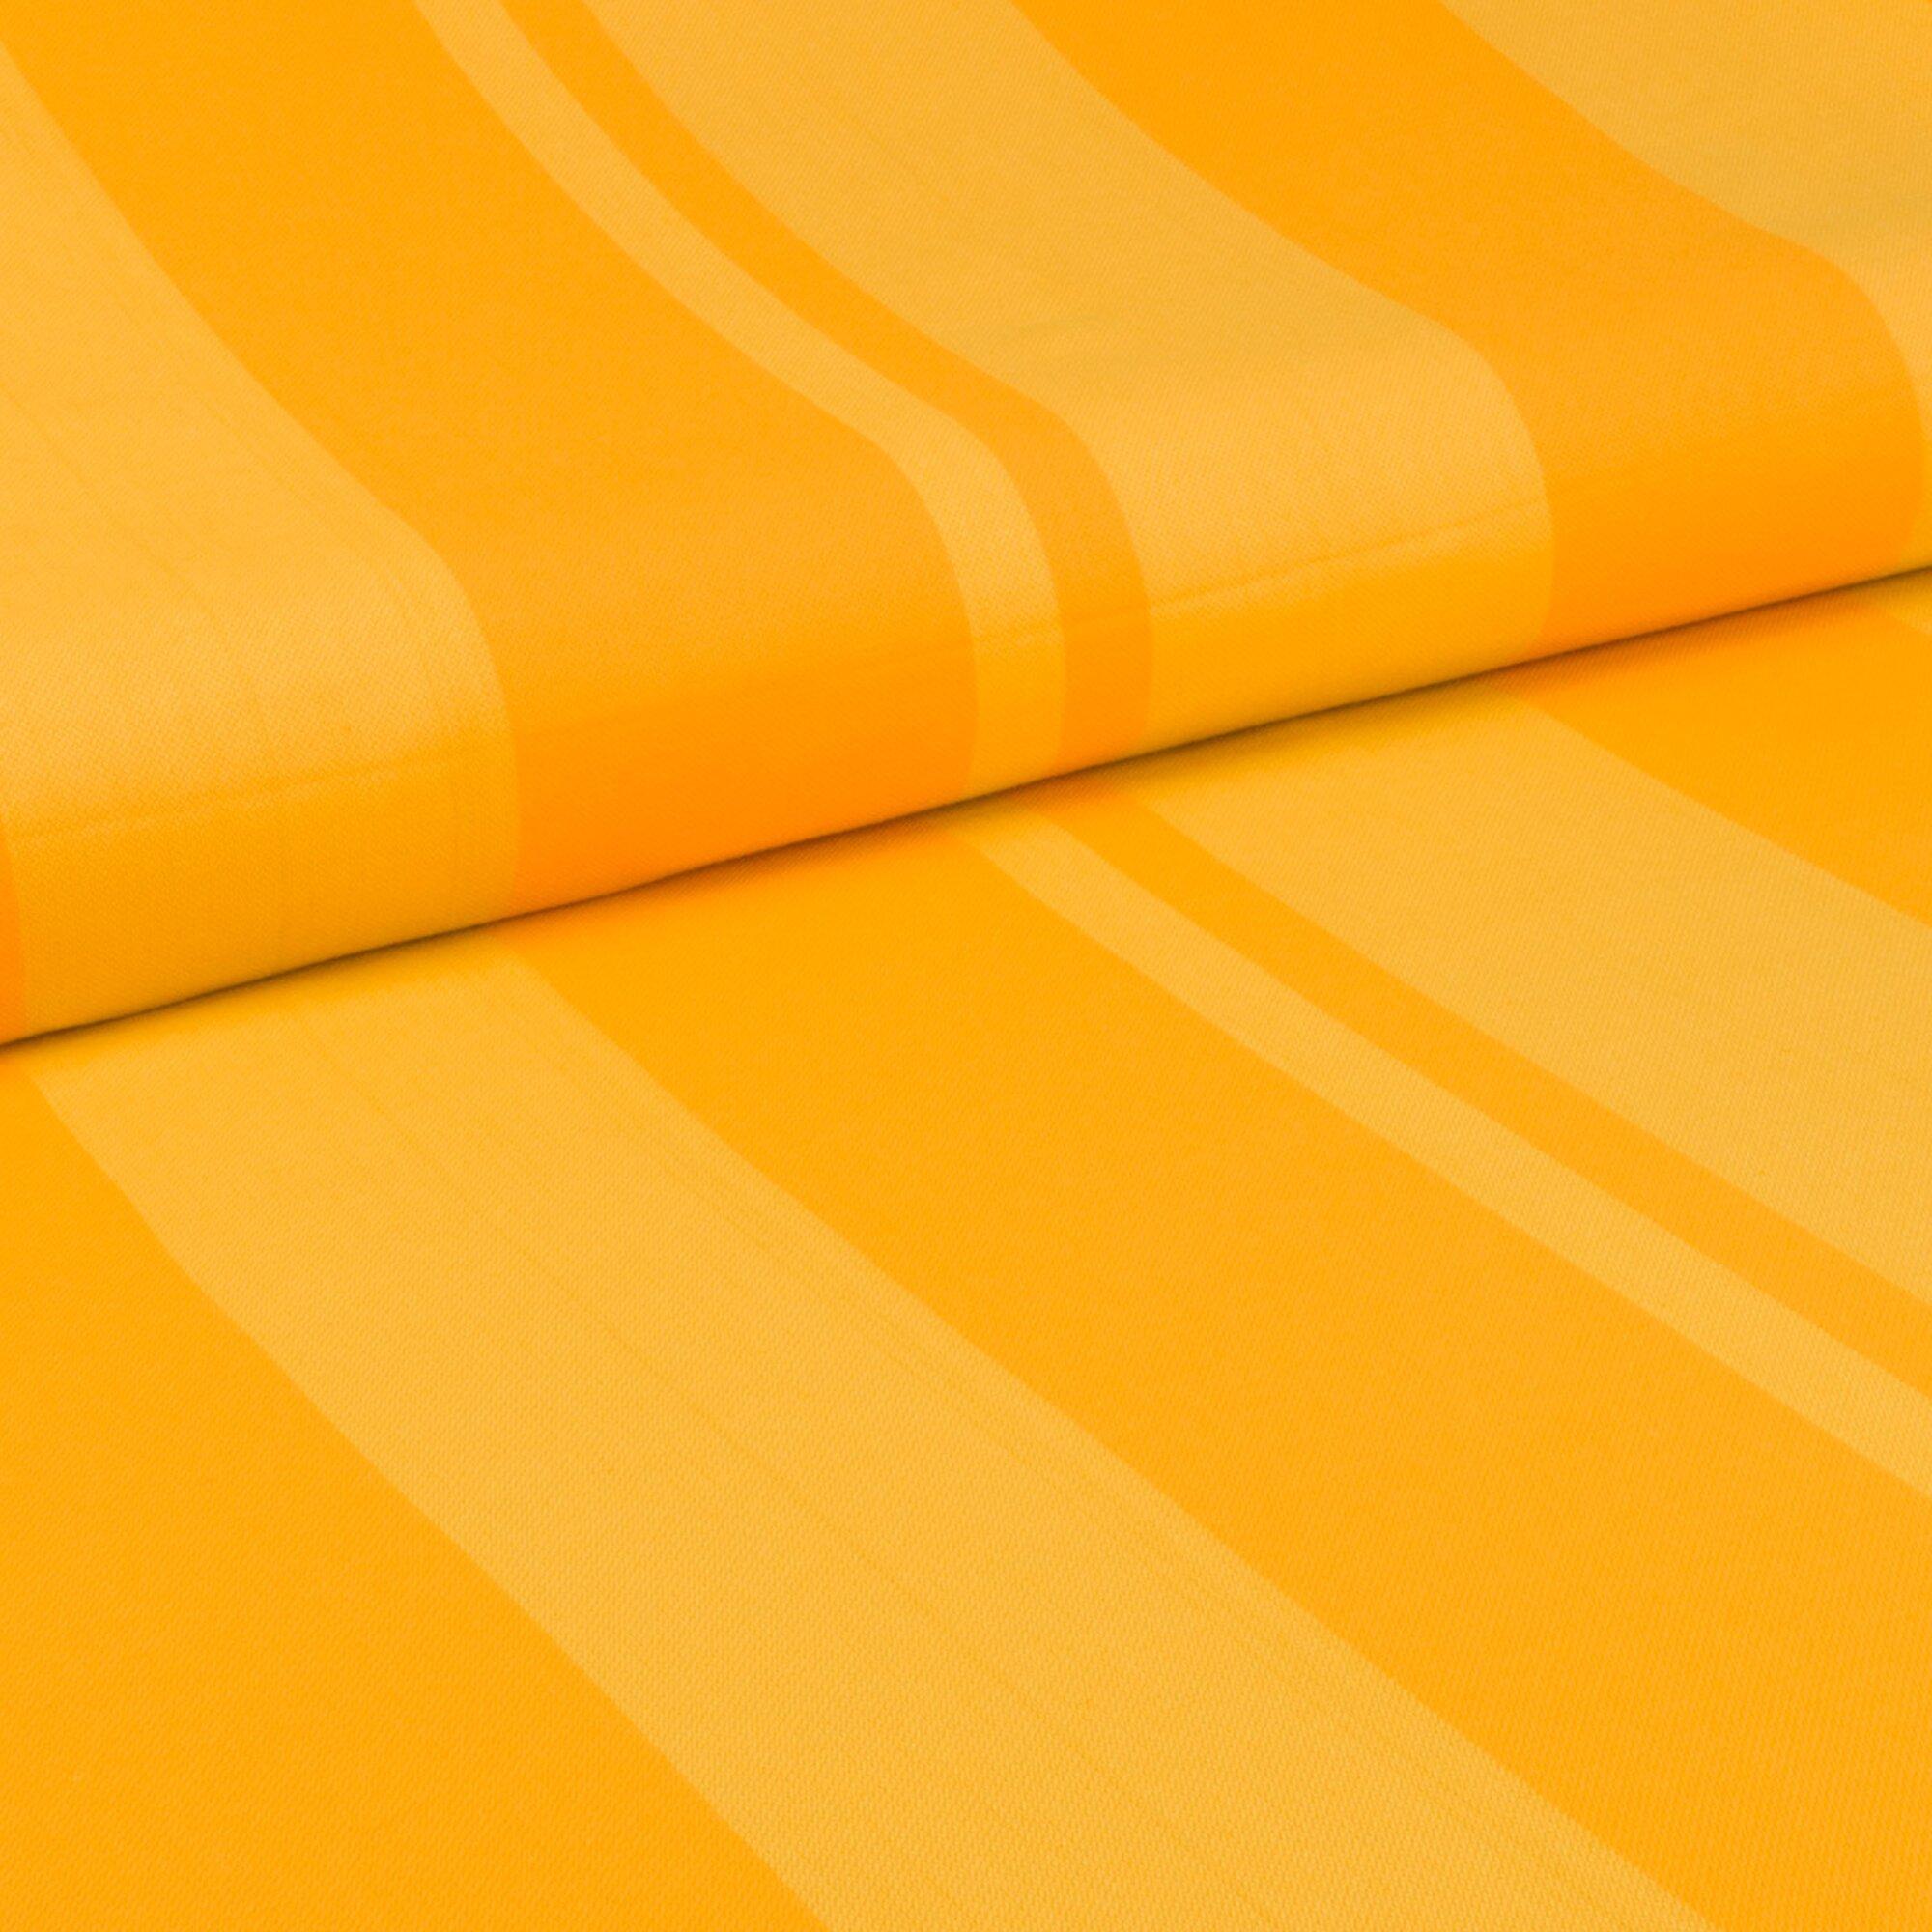 easymaxx-hoppediz-ring-sling-mit-streifen-orange, 54.99 EUR @ babywalz-de